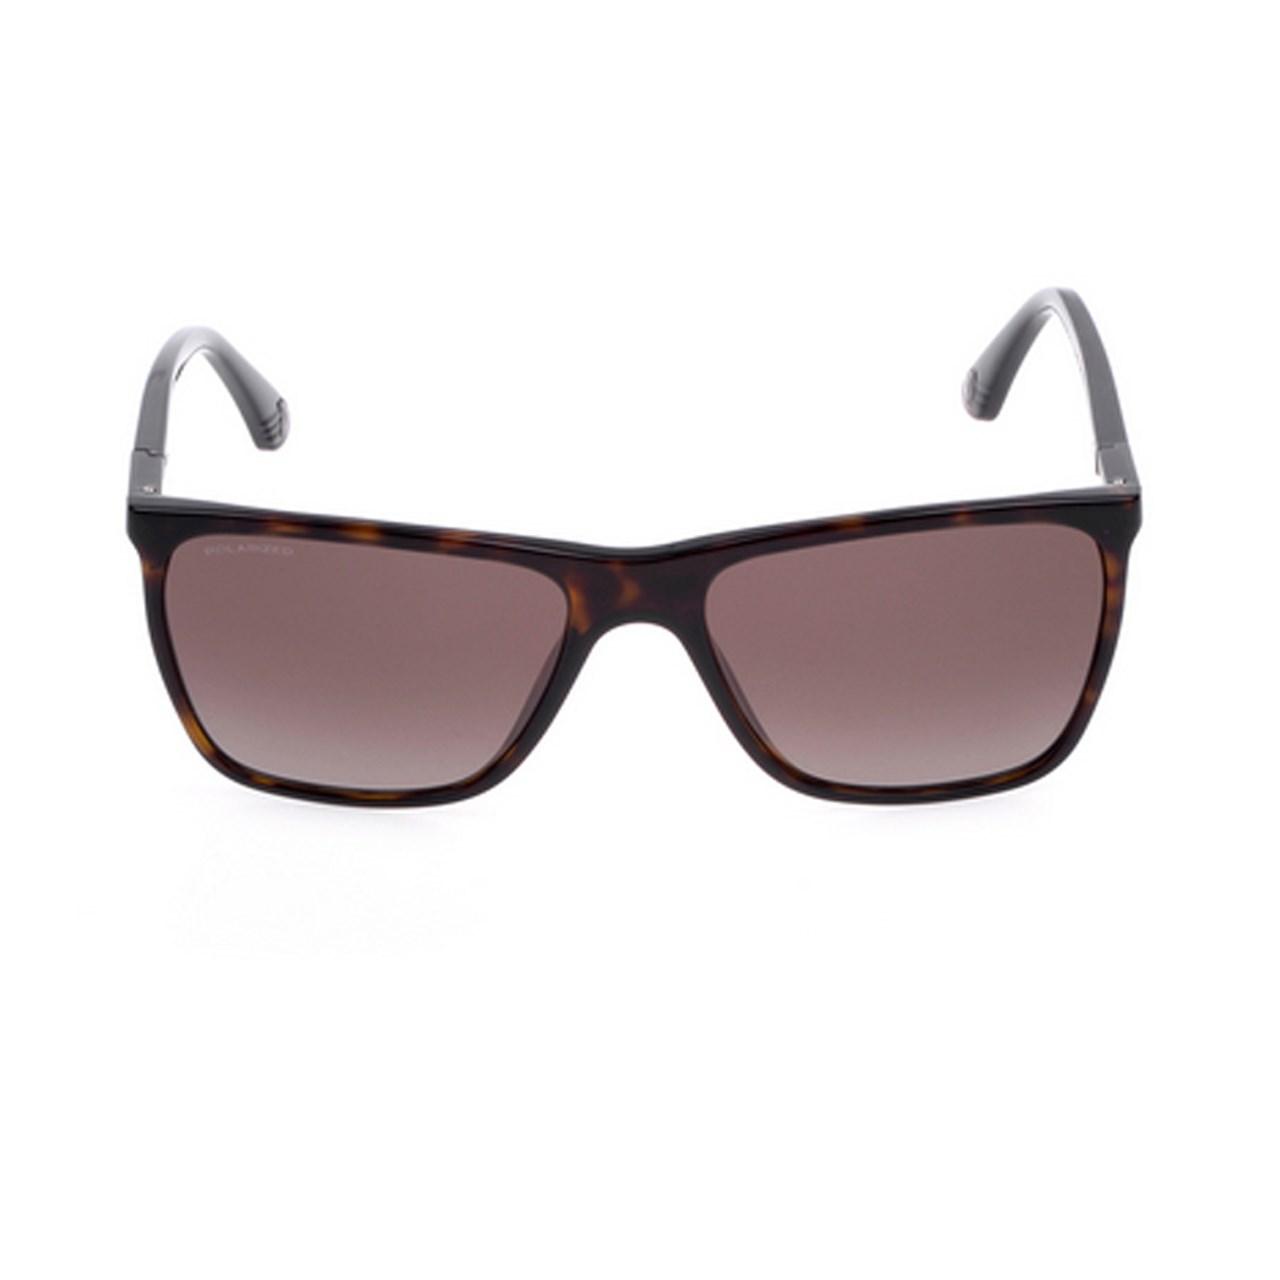 عینک آفتابی پلیس مدل BROOKLYN 2